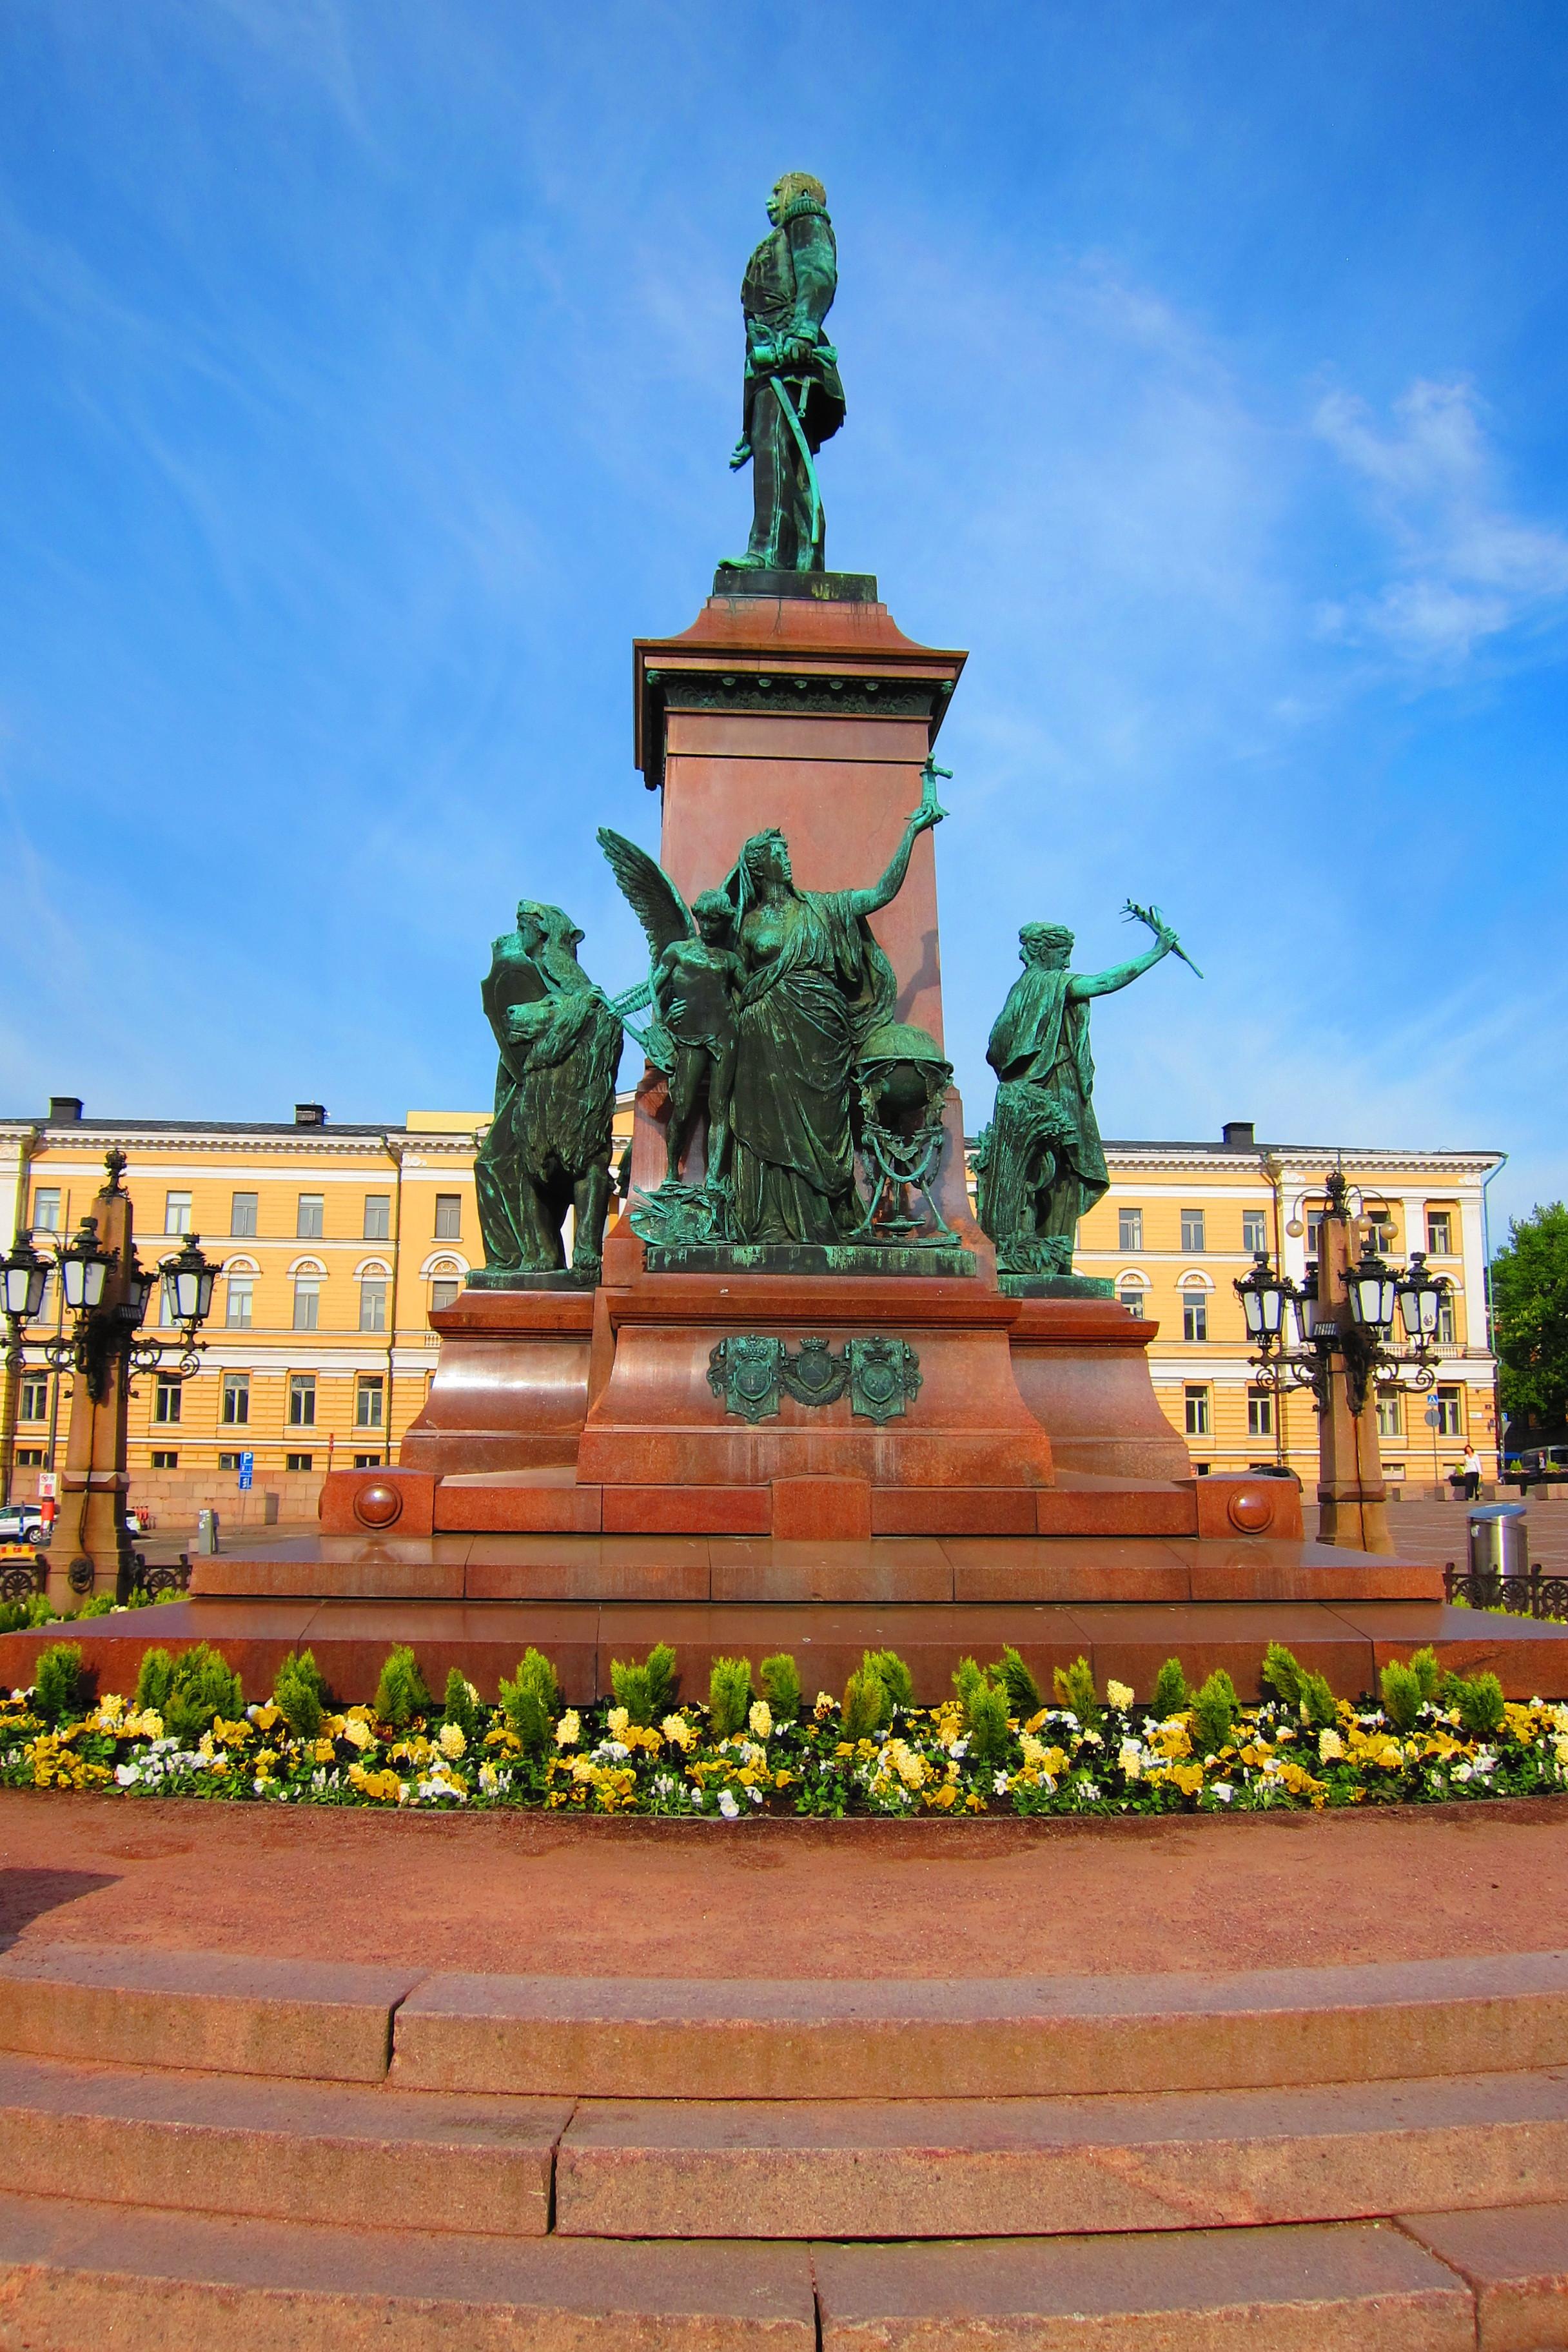 Senate Square Statue, Helsinki, 5/19/19